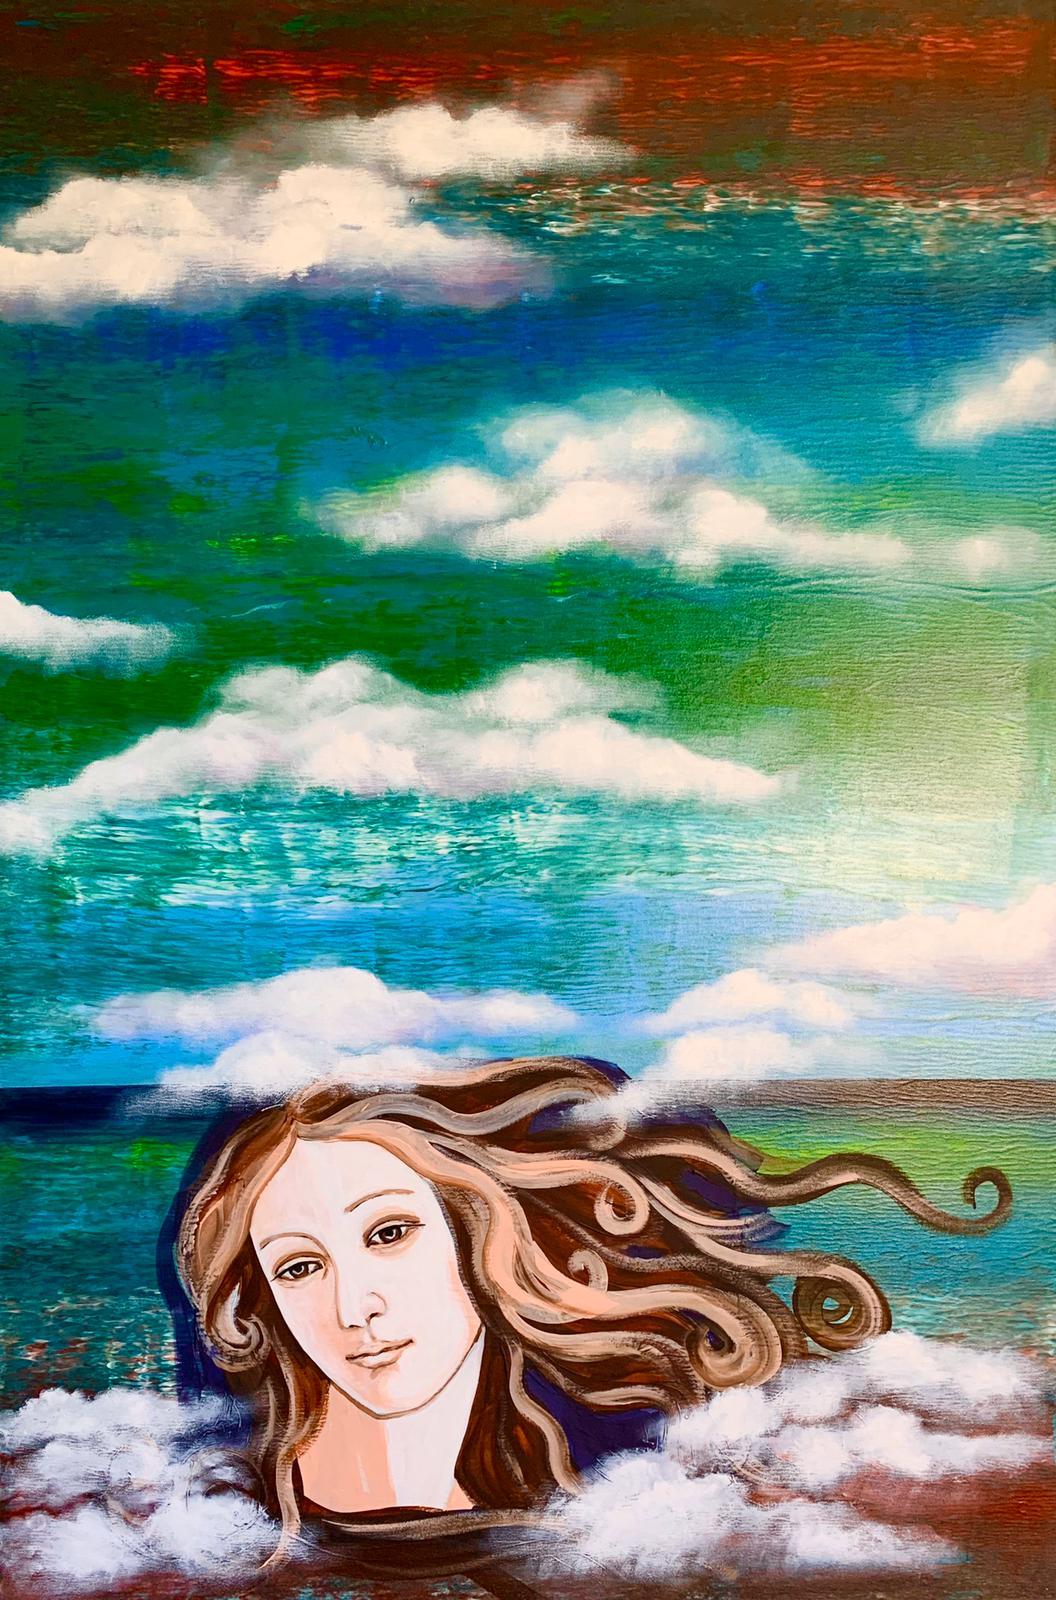 """Woman. Water. Art"" 2 part of diptych / ""Женщина. Вода. Арт"" 2 часть диптиха"